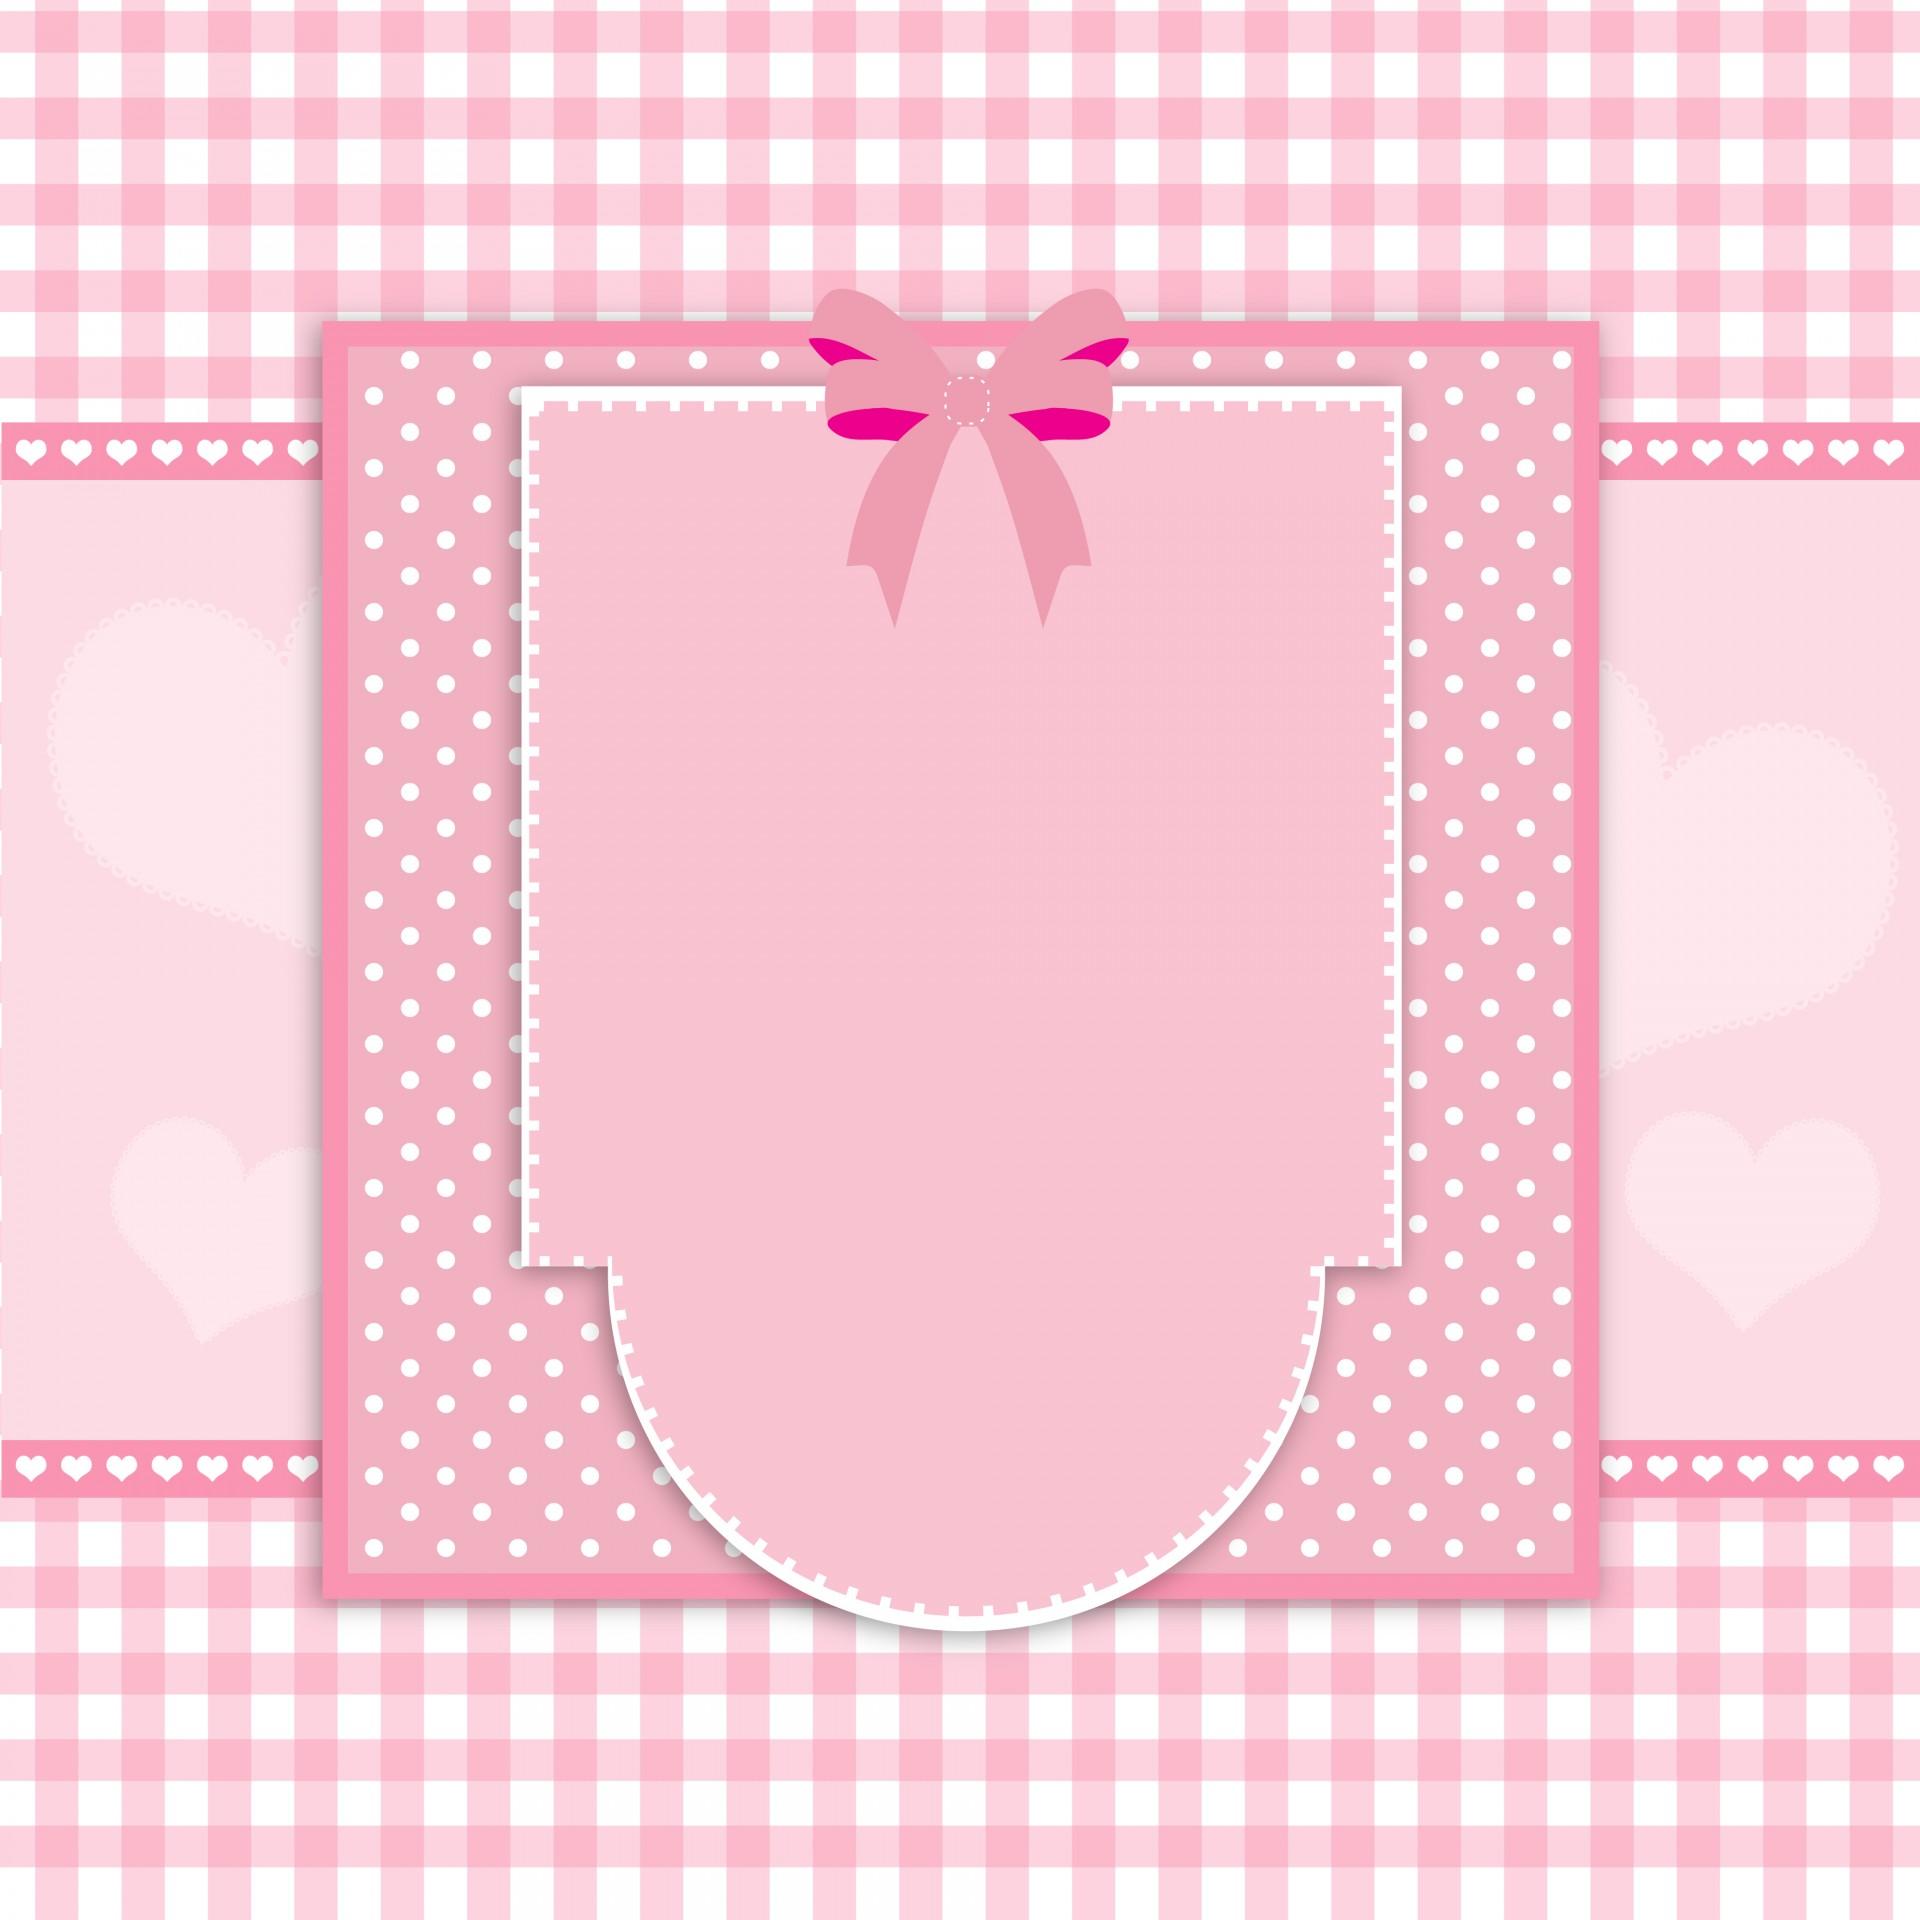 Black And White Polka Dot Wallpaper Border Fancy Pink Card Frame Free Stock Photo Public Domain